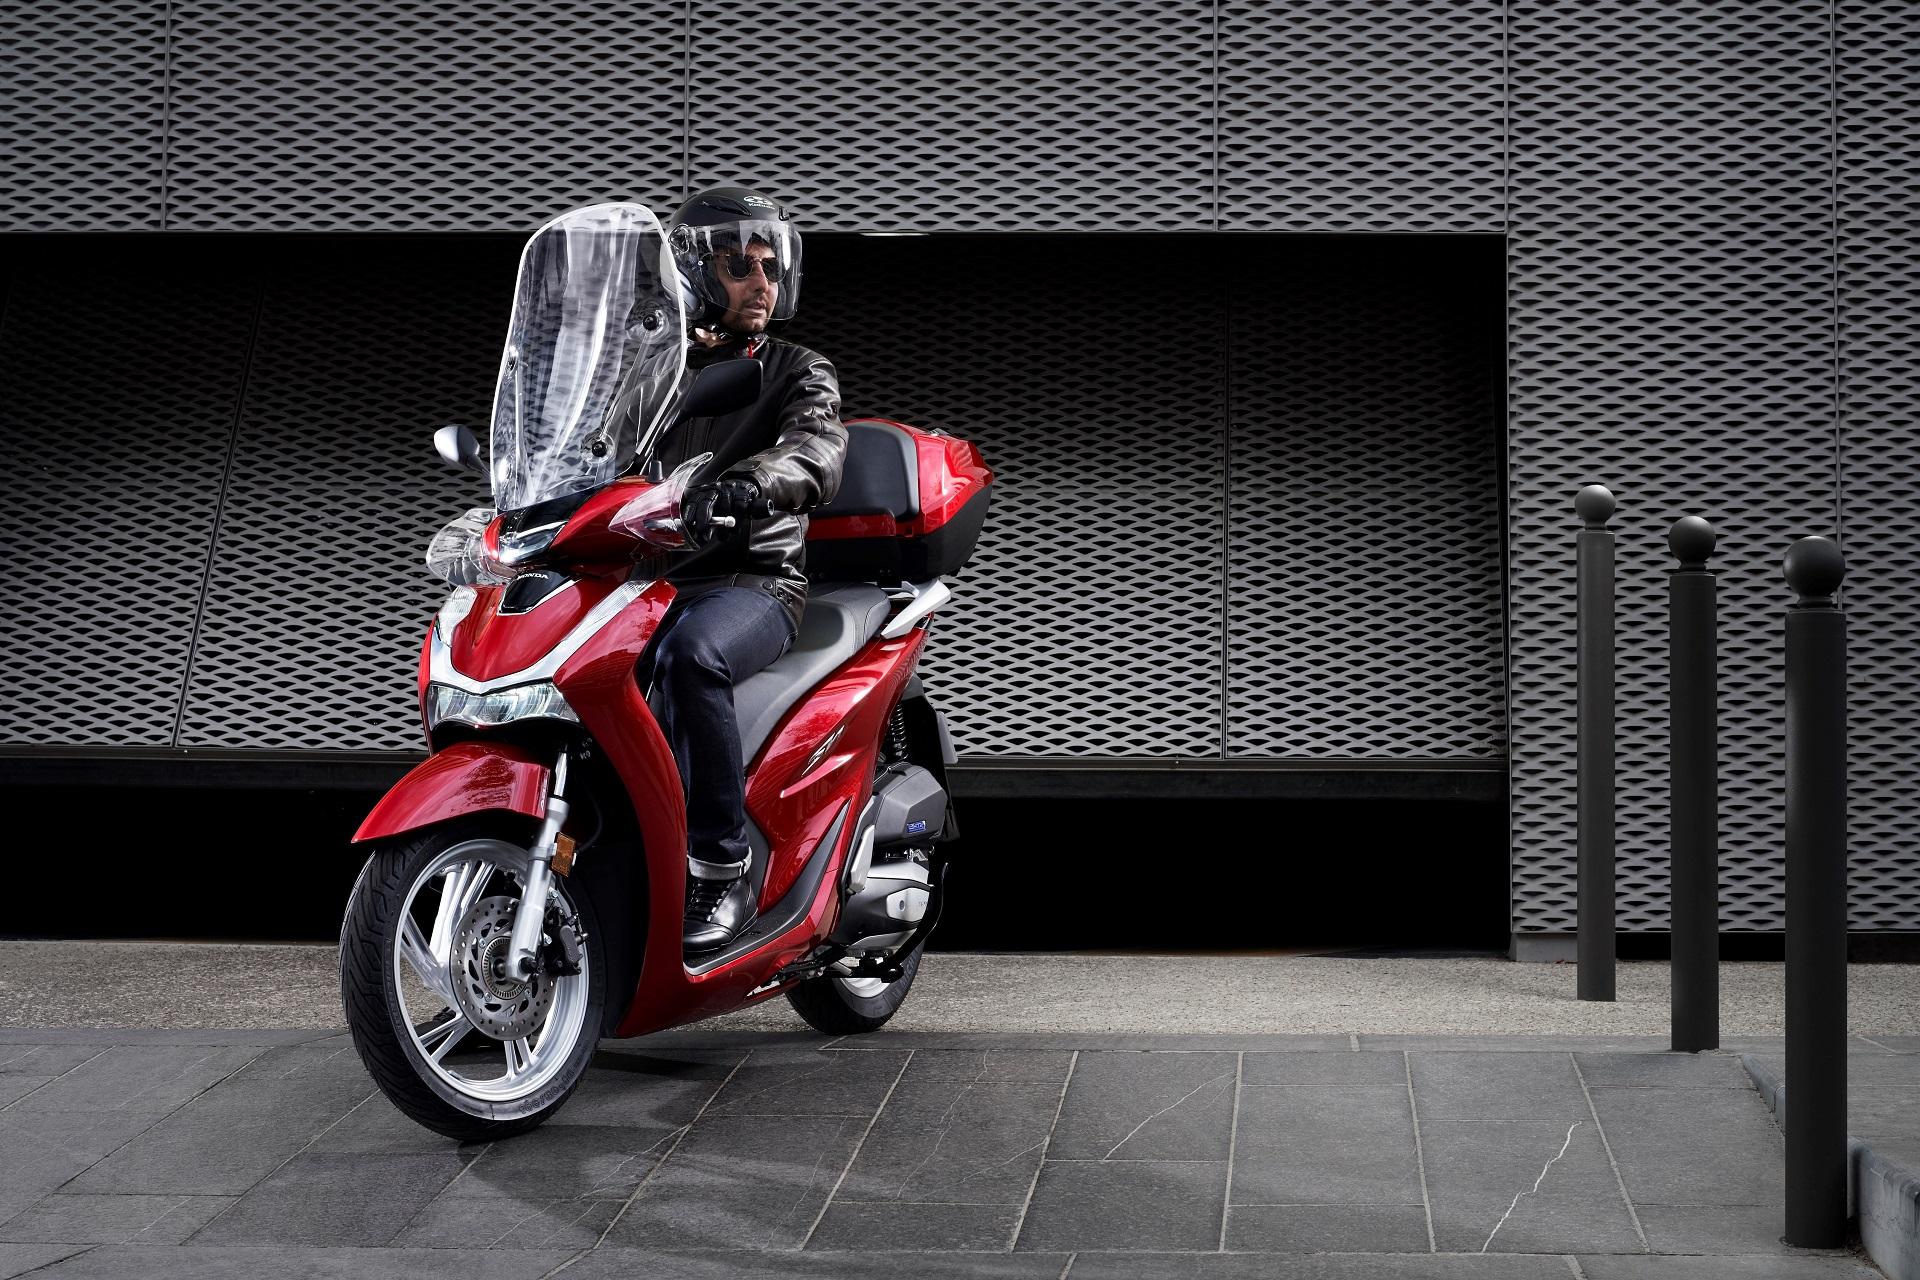 Honda SH150i ABS Dobozzal 2020